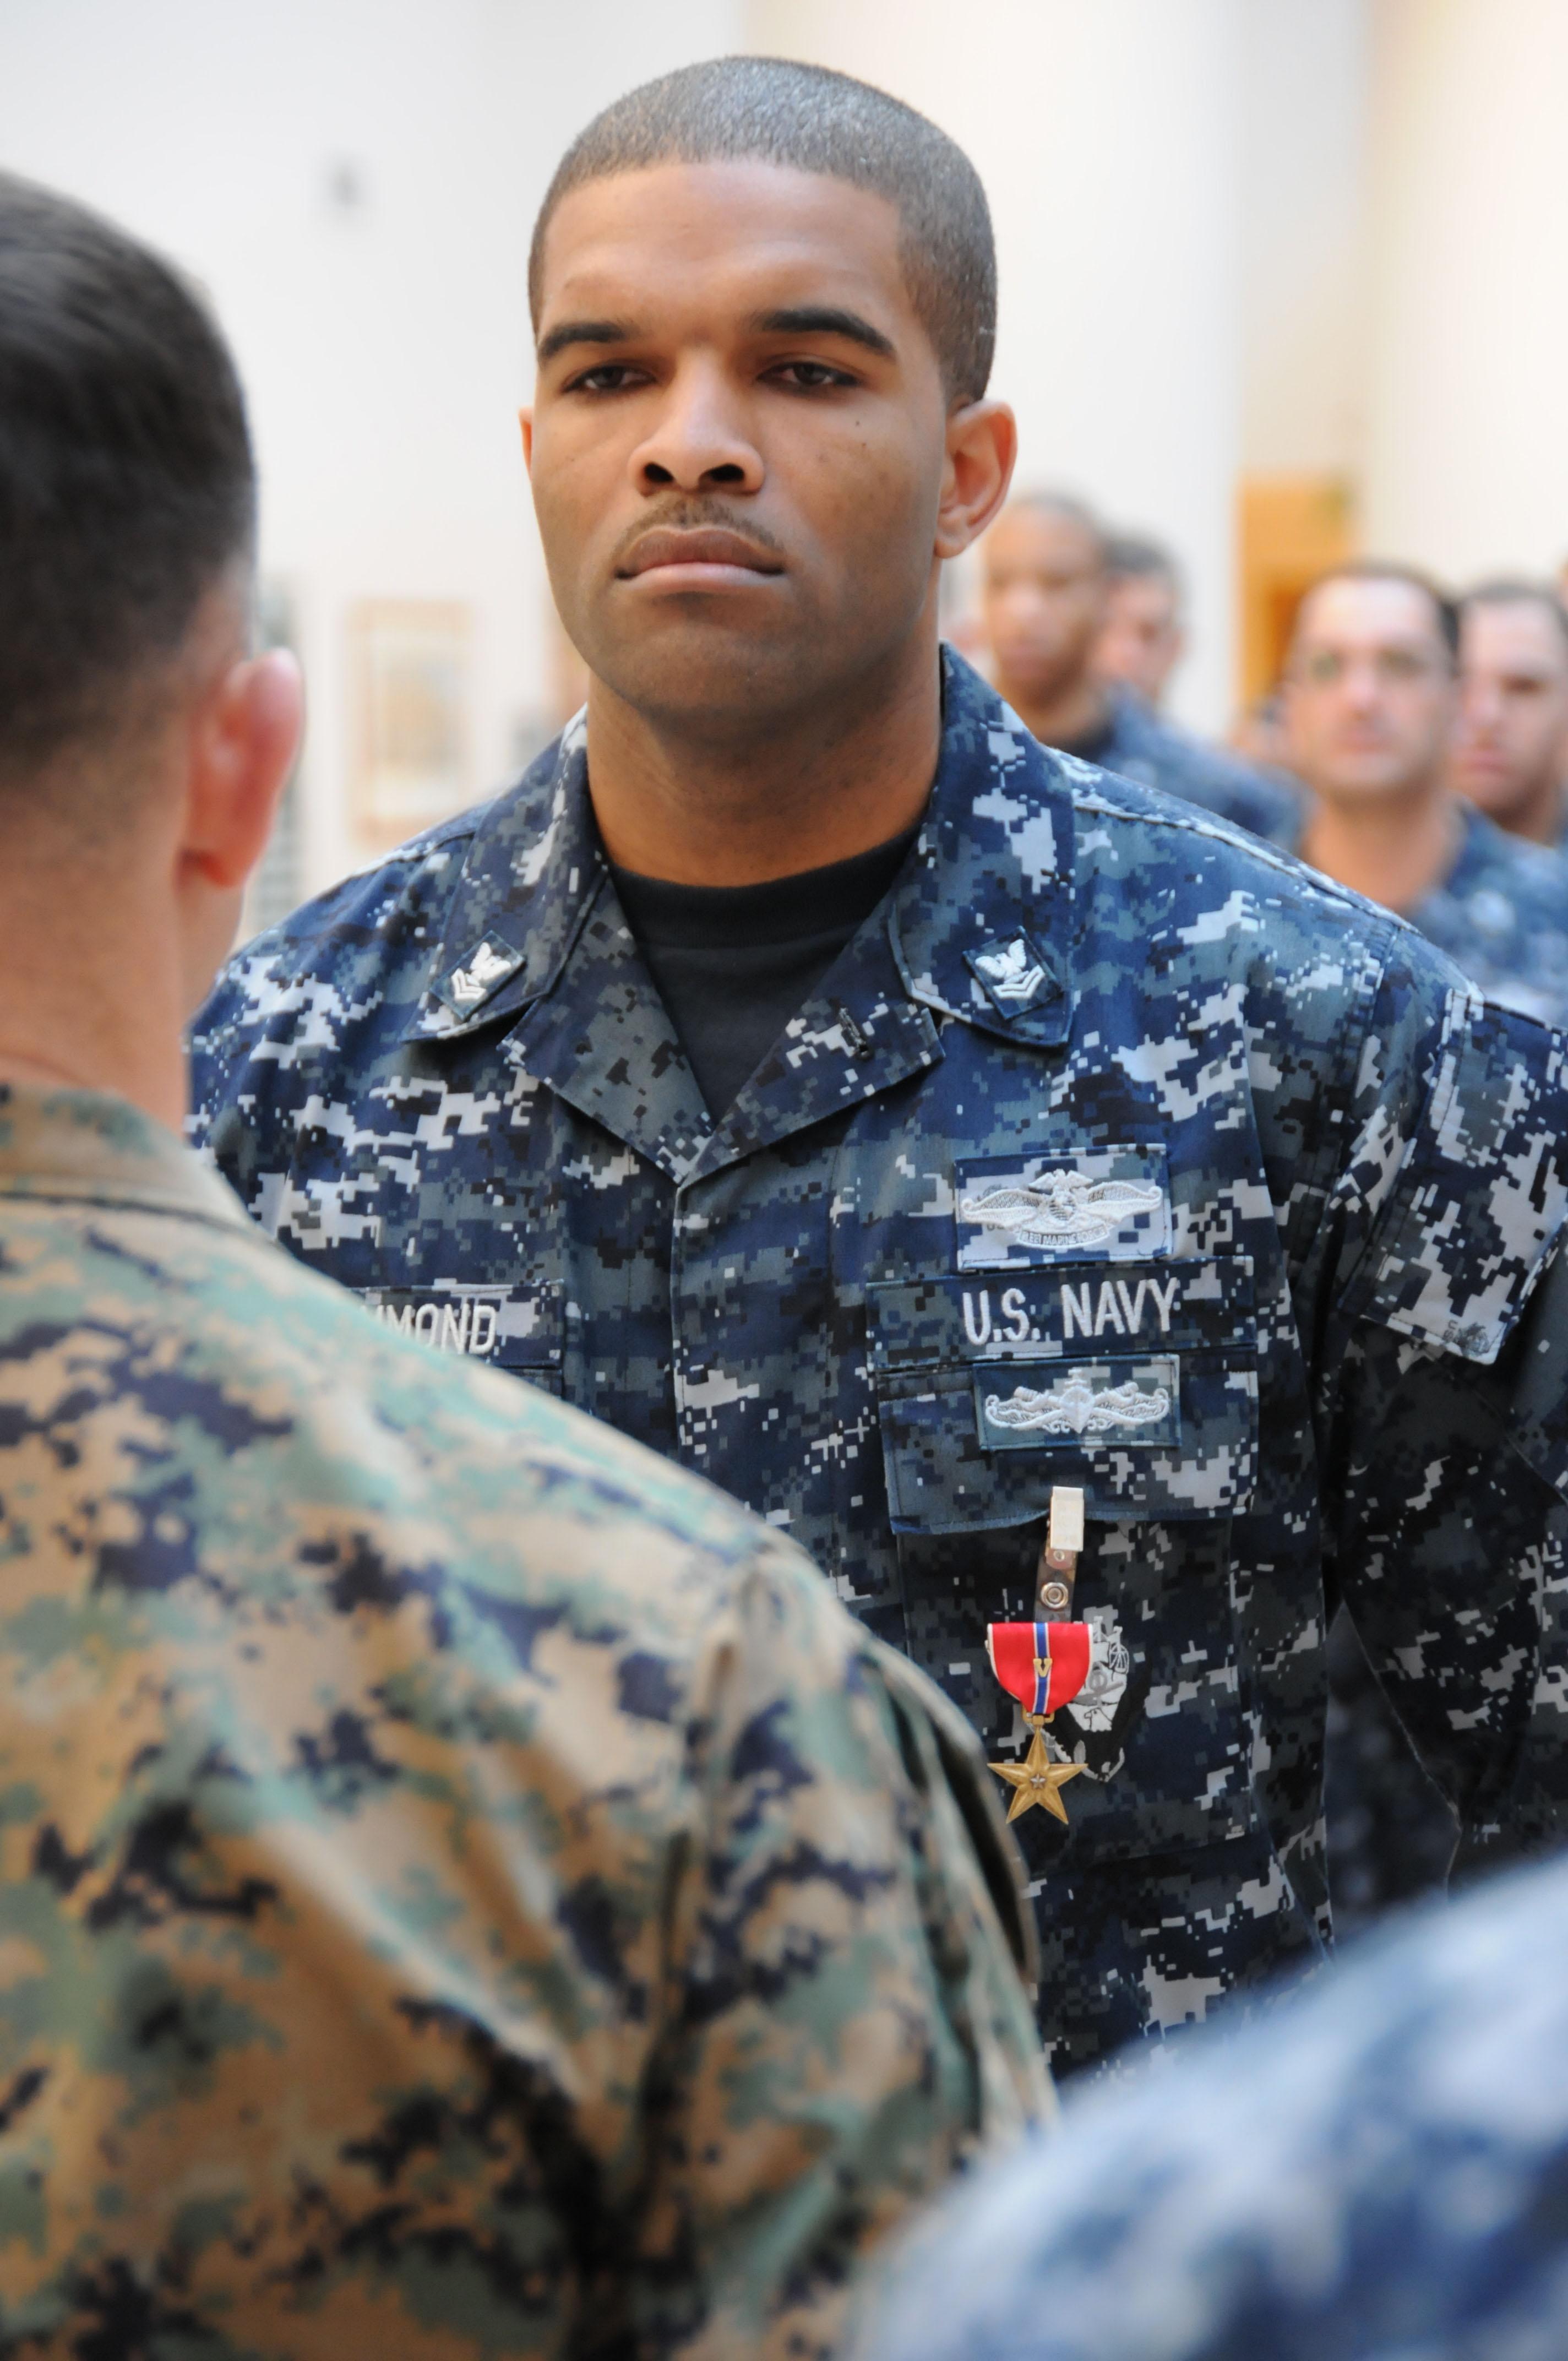 marine fire team